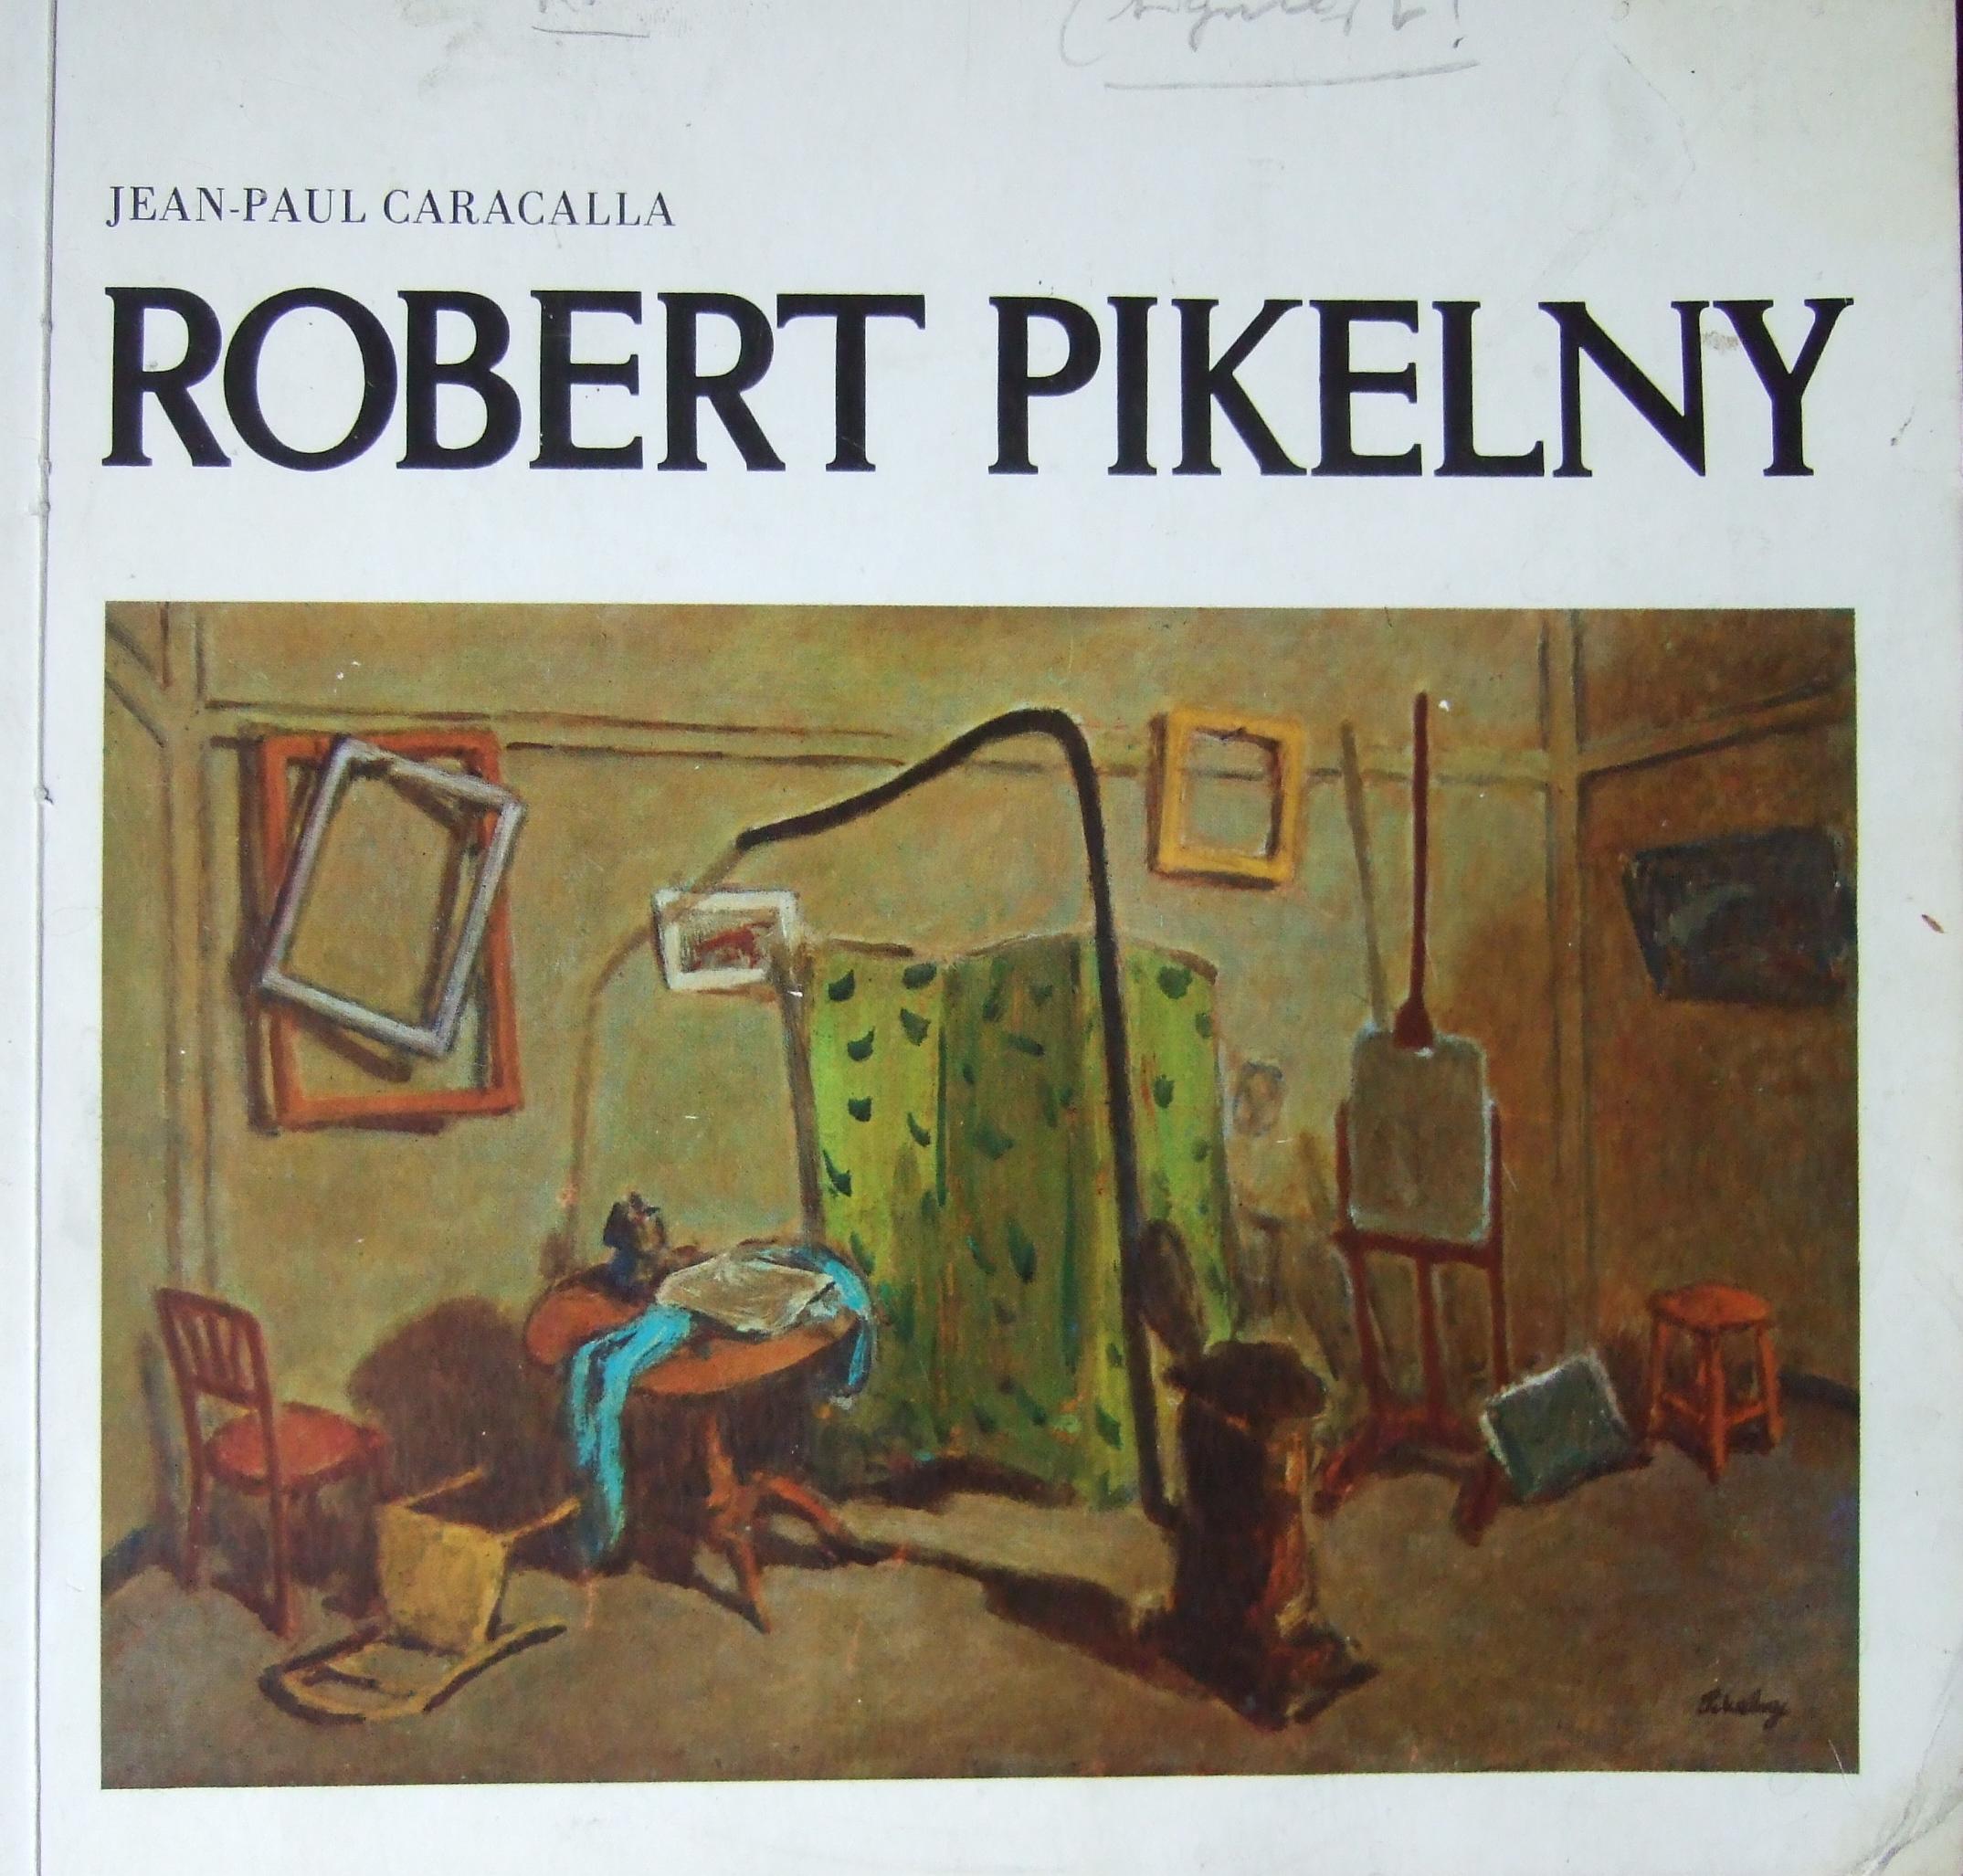 Robert Pikelny